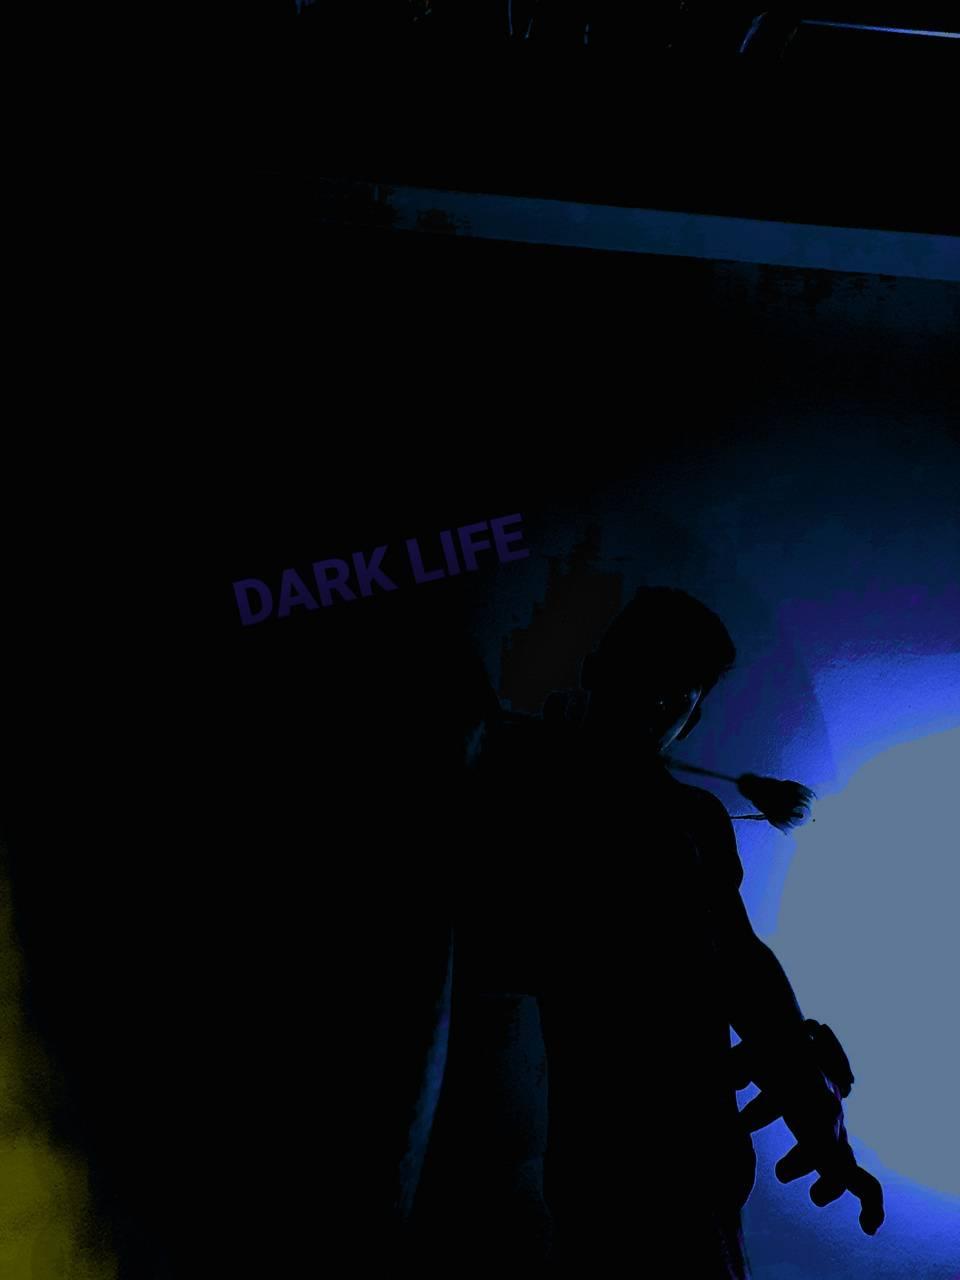 Dark life love